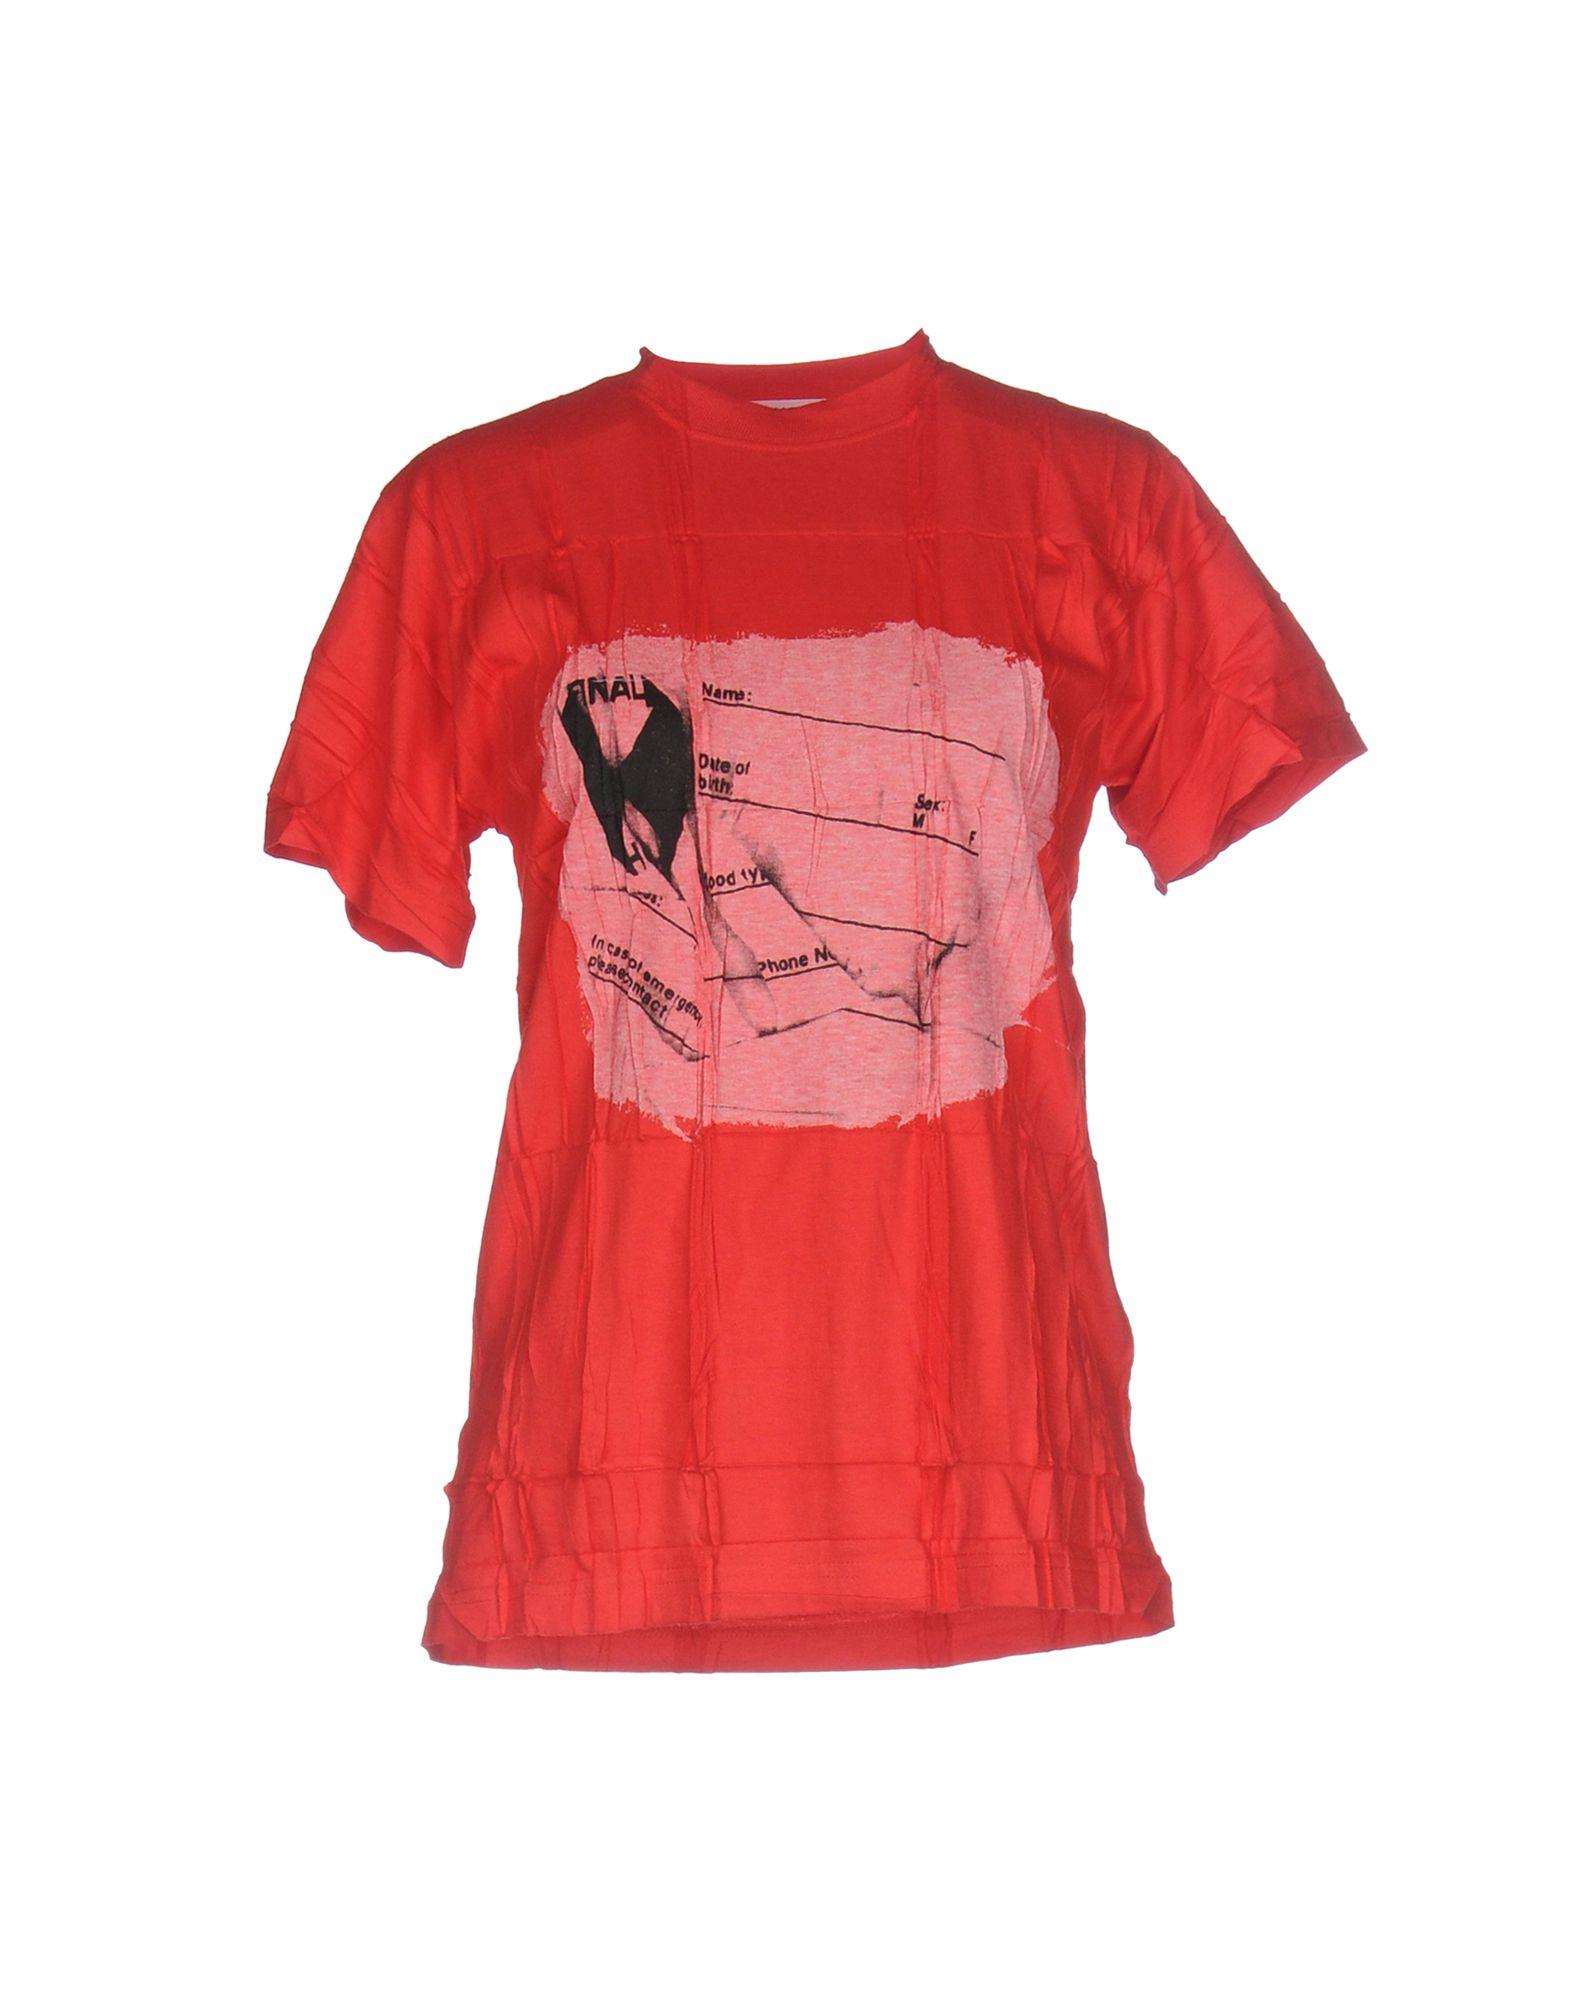 FINAL HOME T-shirts